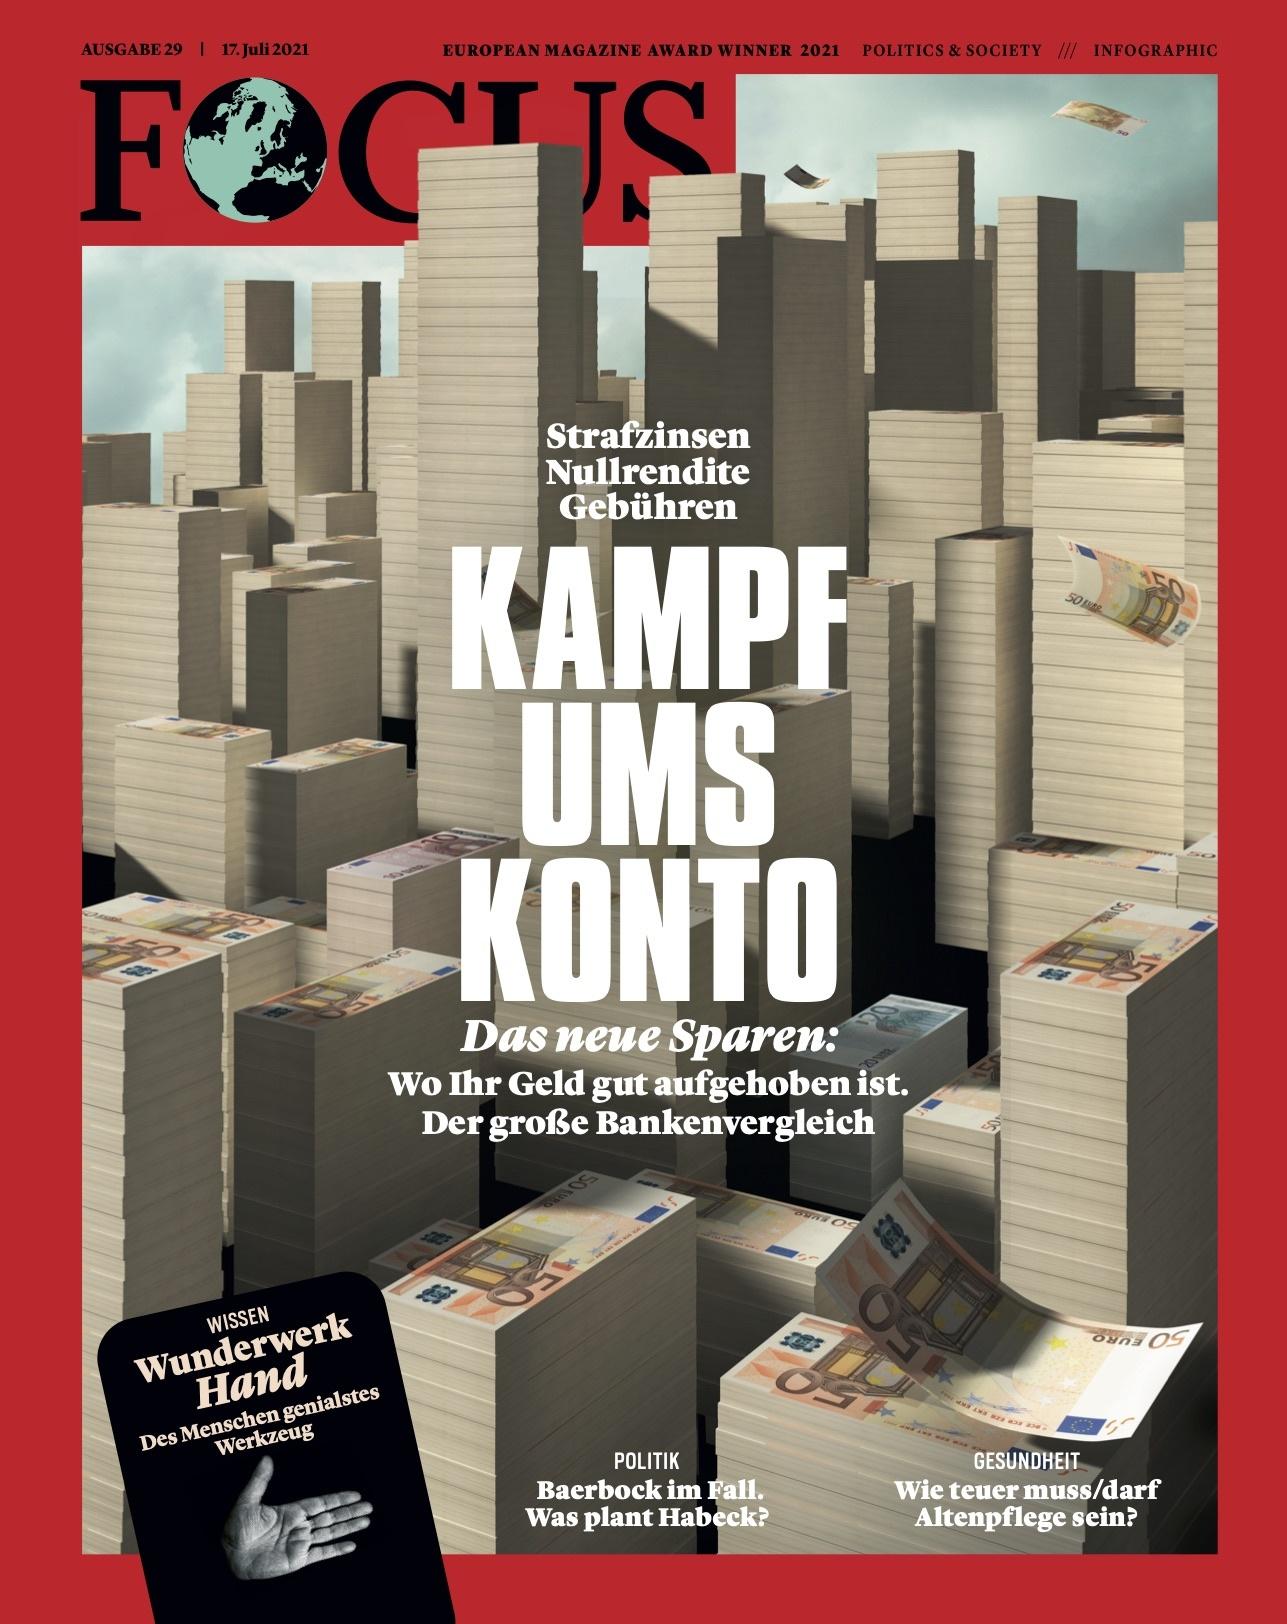 FOCUS Magazin FOCUS Magazin - Kampf ums Konto